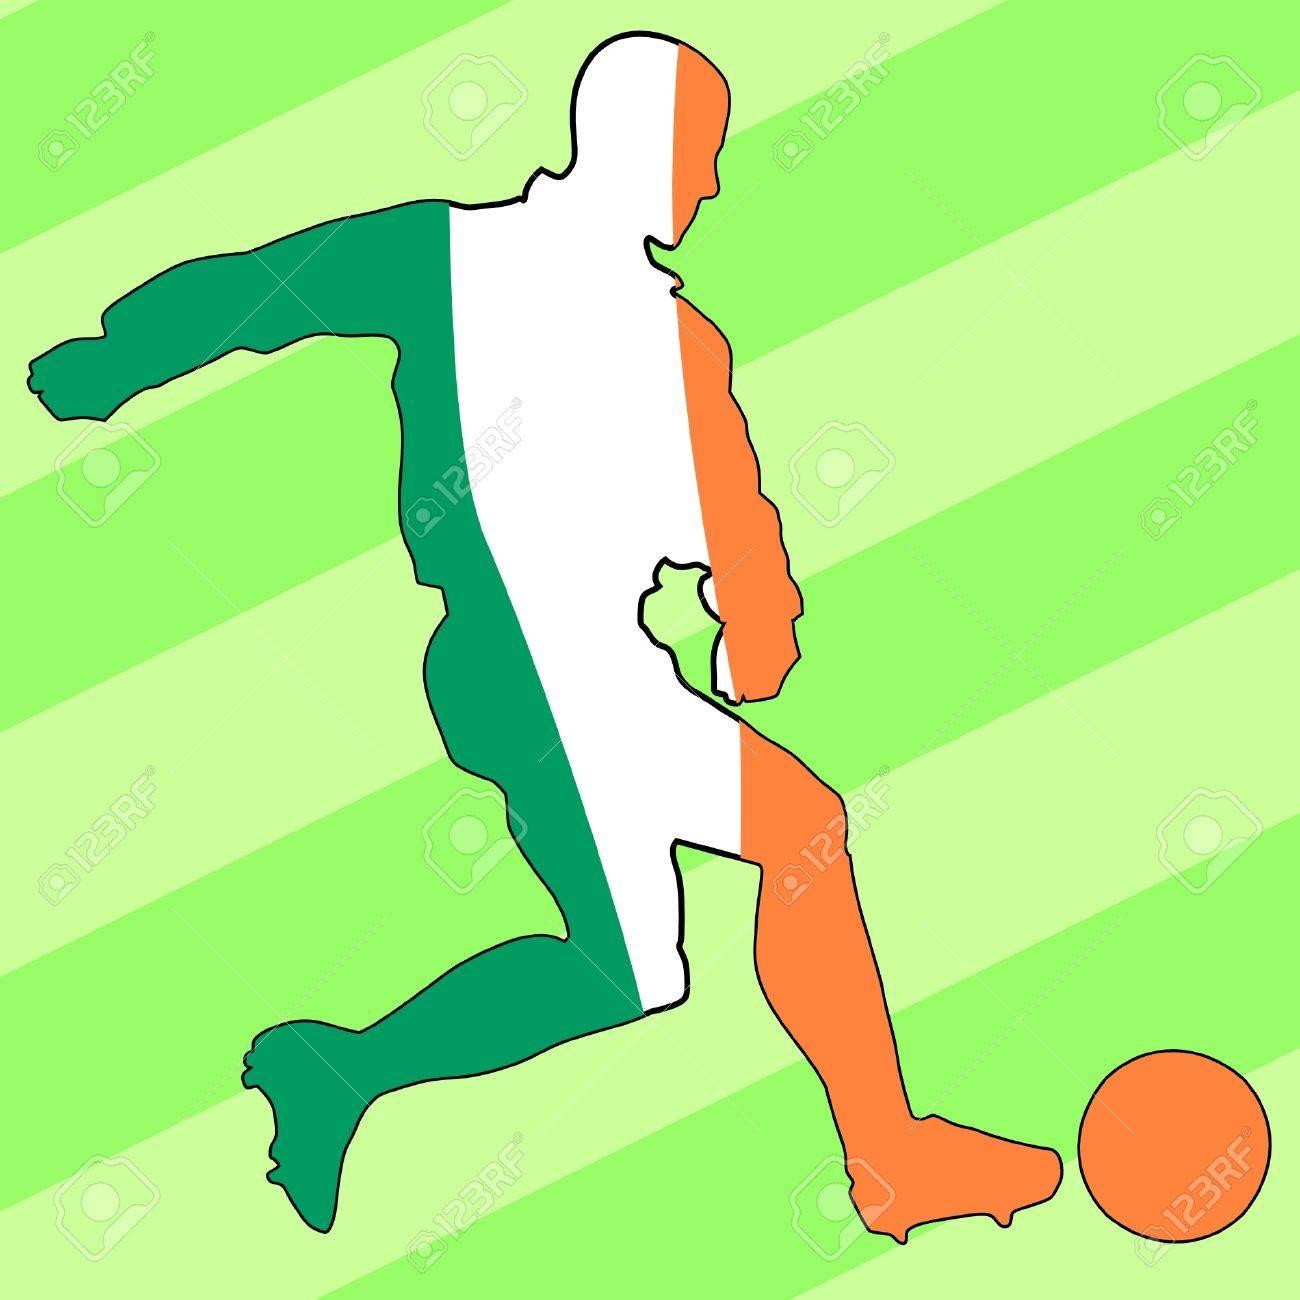 football colours of Ireland Stock Vector - 11749338